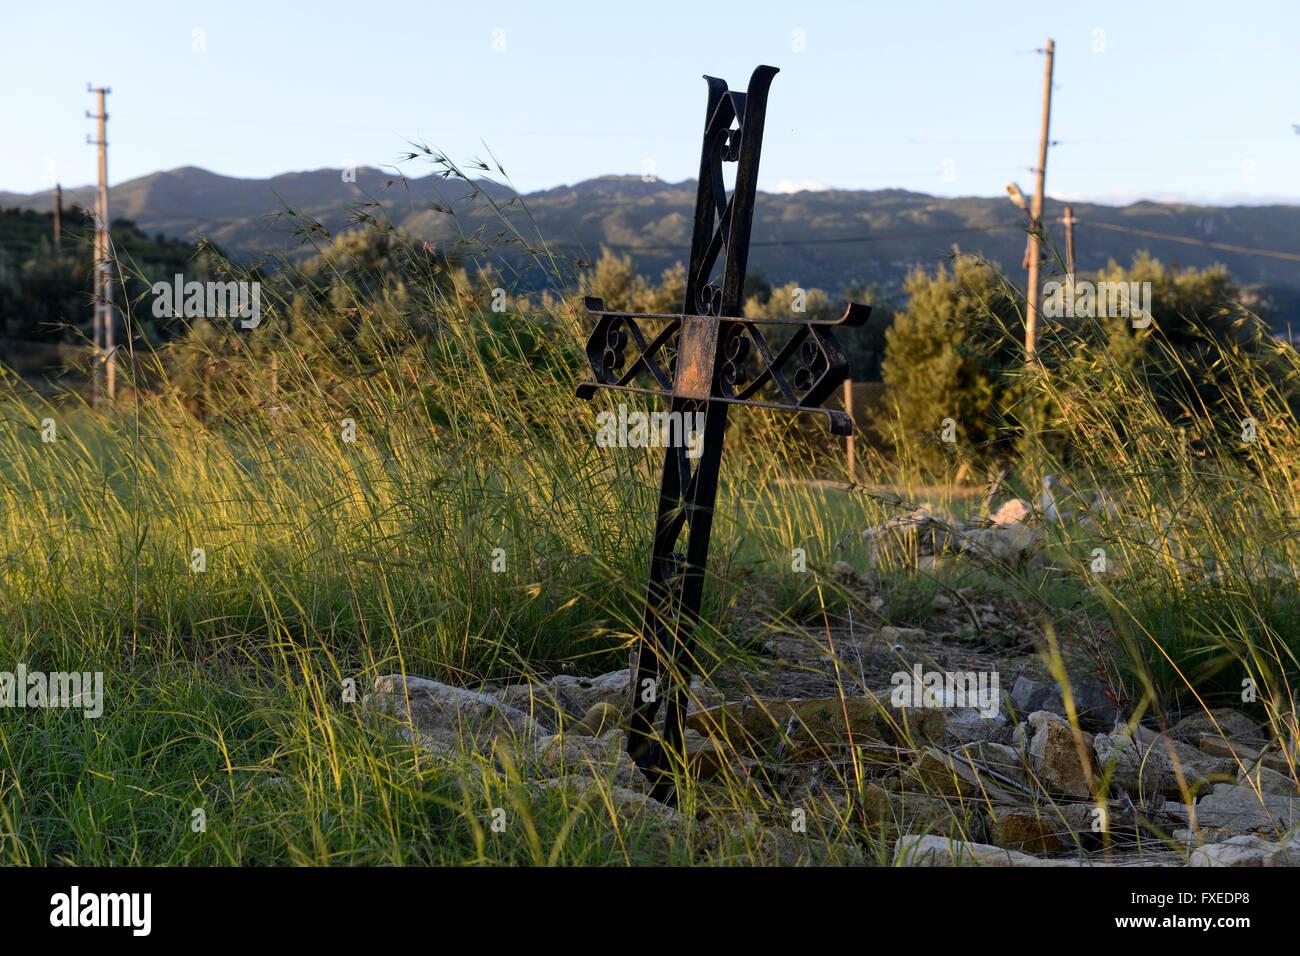 TURKEY Antakya, Musa Dagh, armenian village Vakifli, armenian graveyard, about 4000 armenian villagers fled during Stock Photo